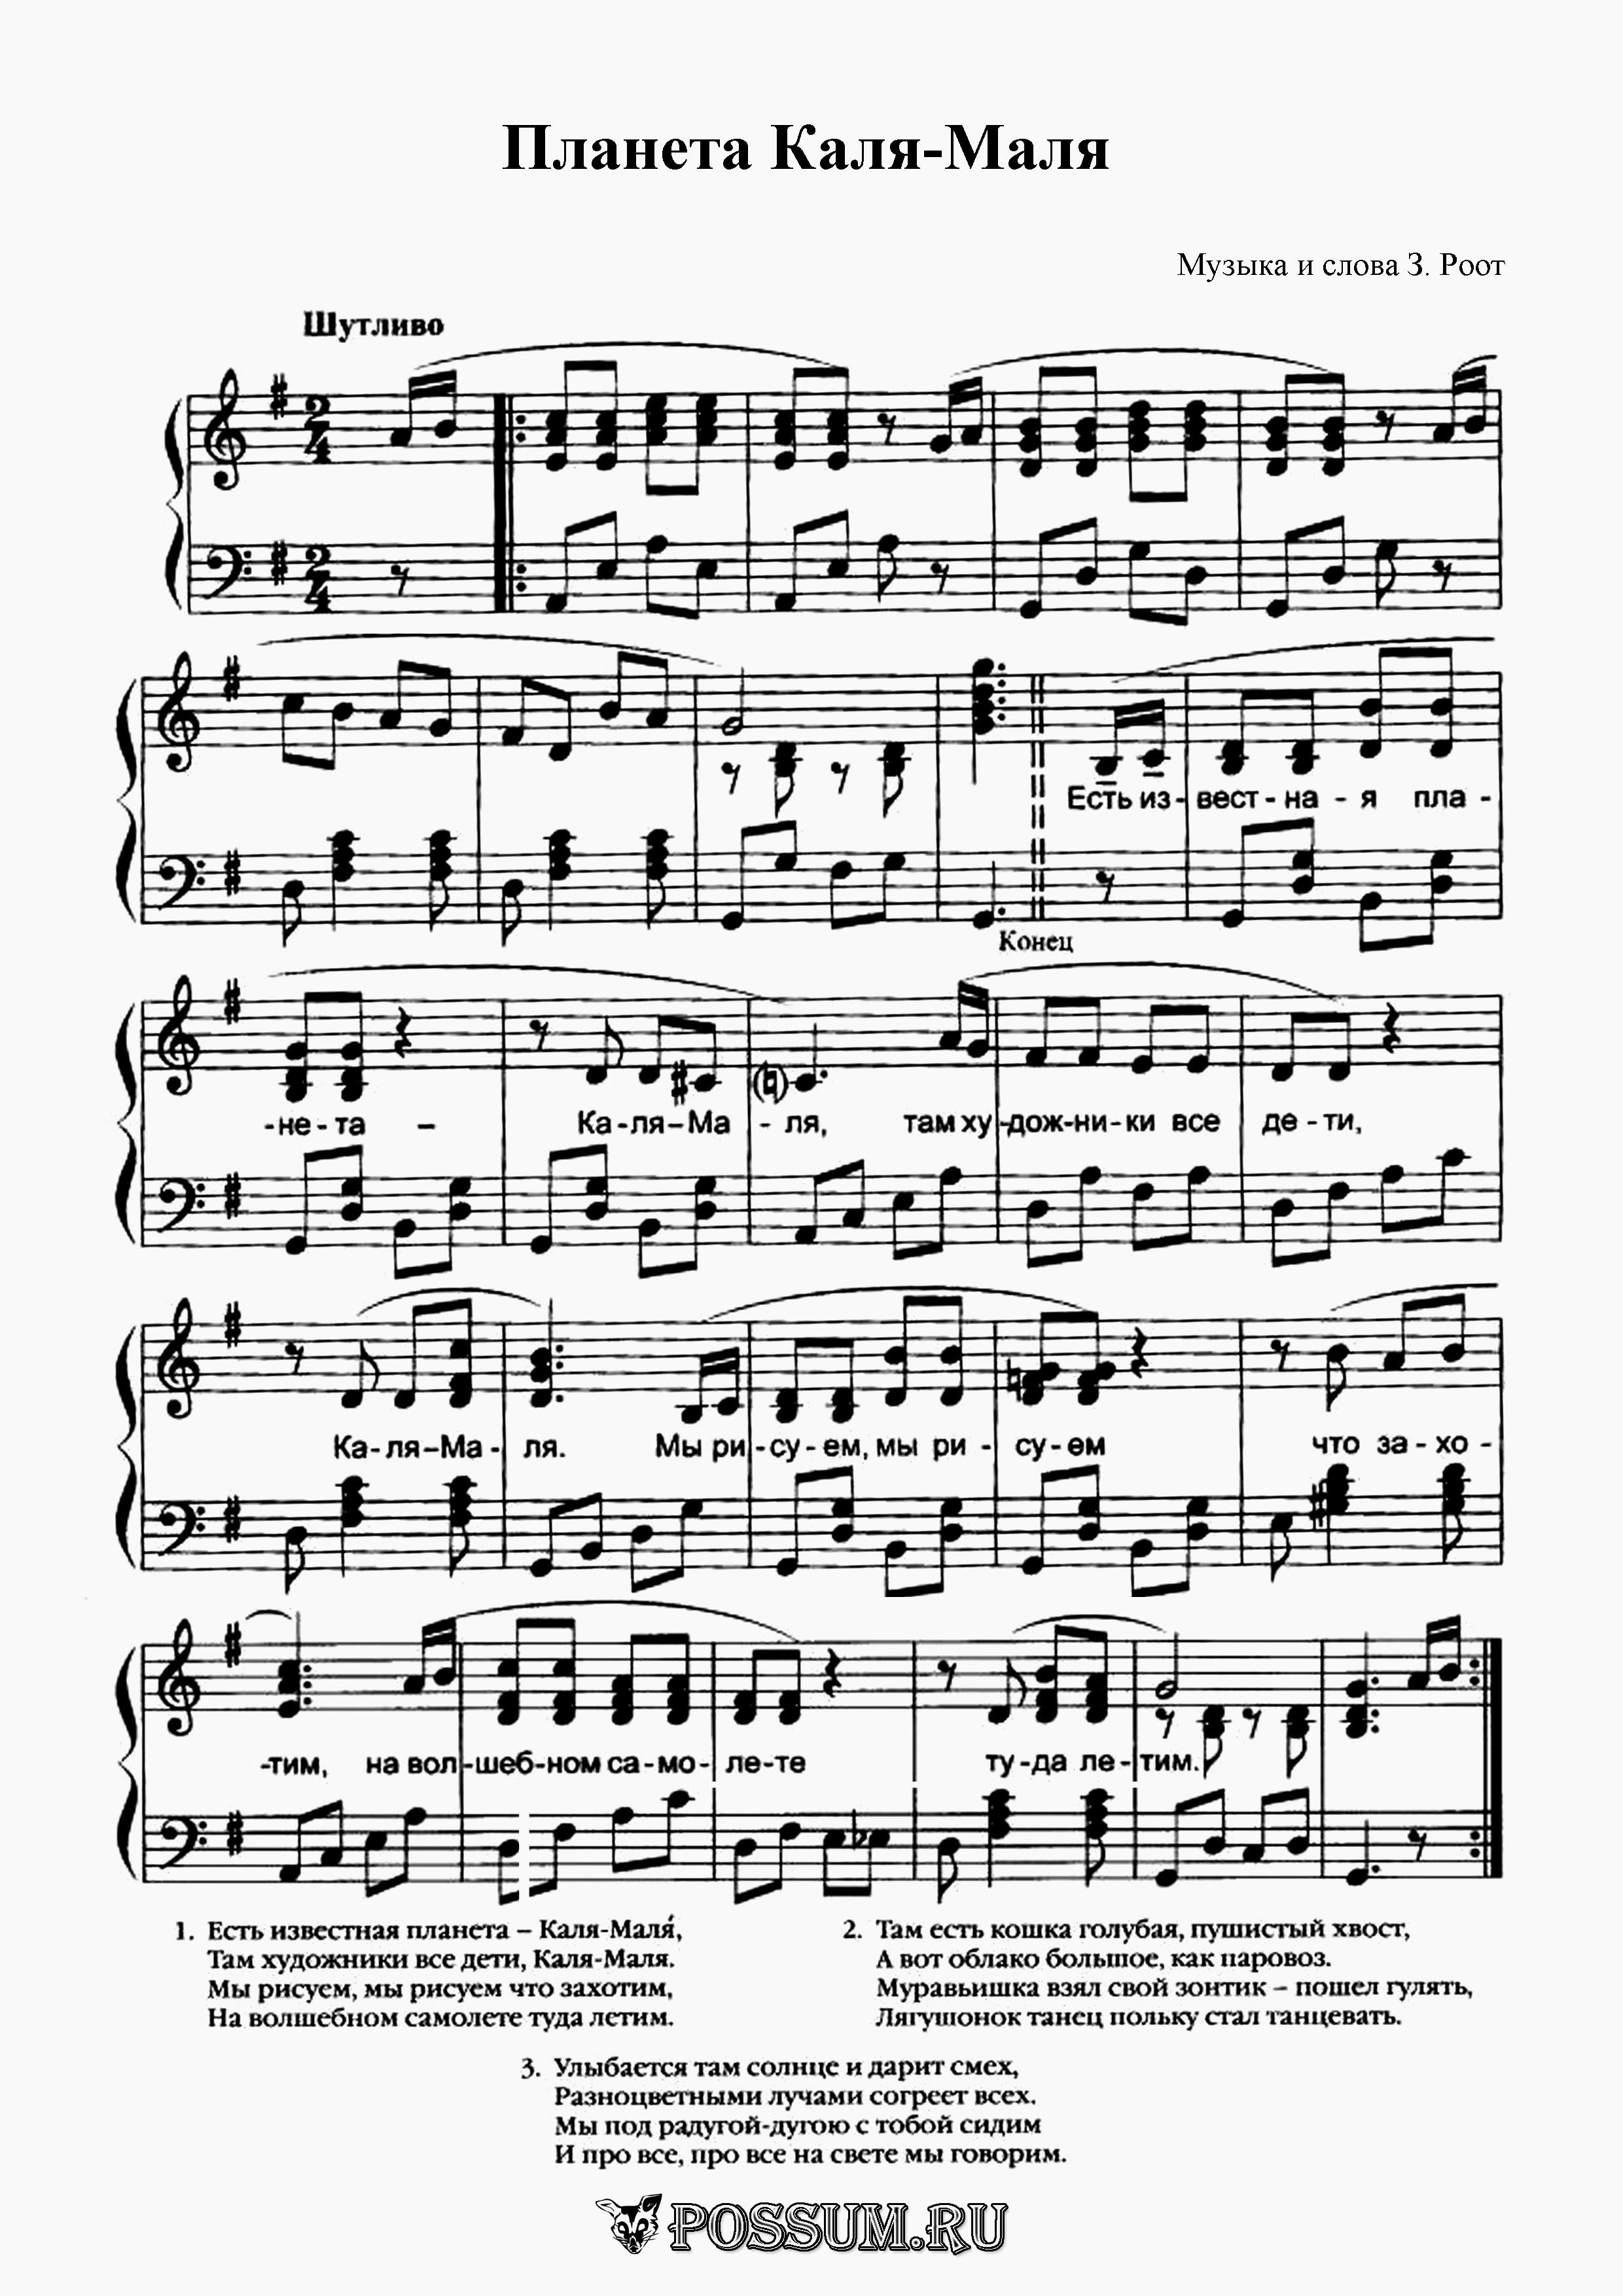 подборка песен для танцев юбилей